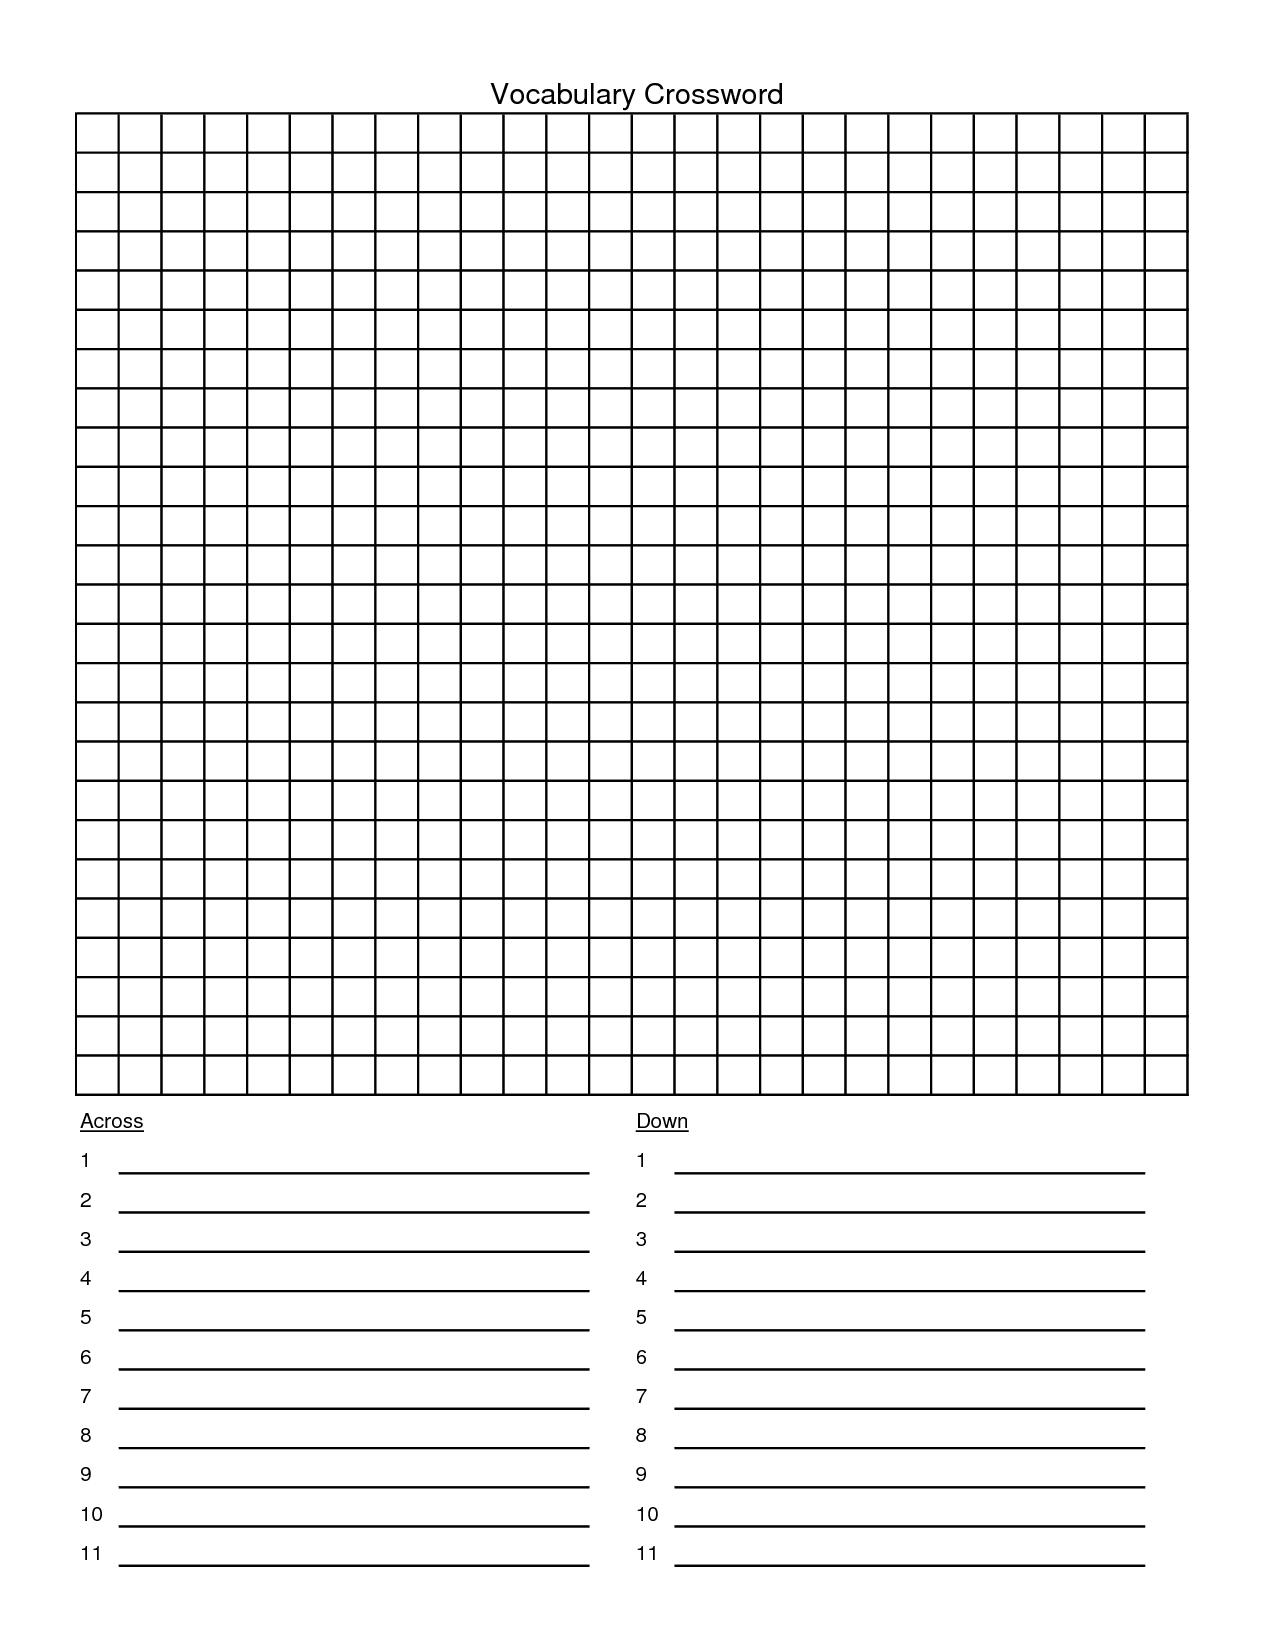 Crossword Puzzle Template - Yapis.sticken.co - Printable Crossword Template